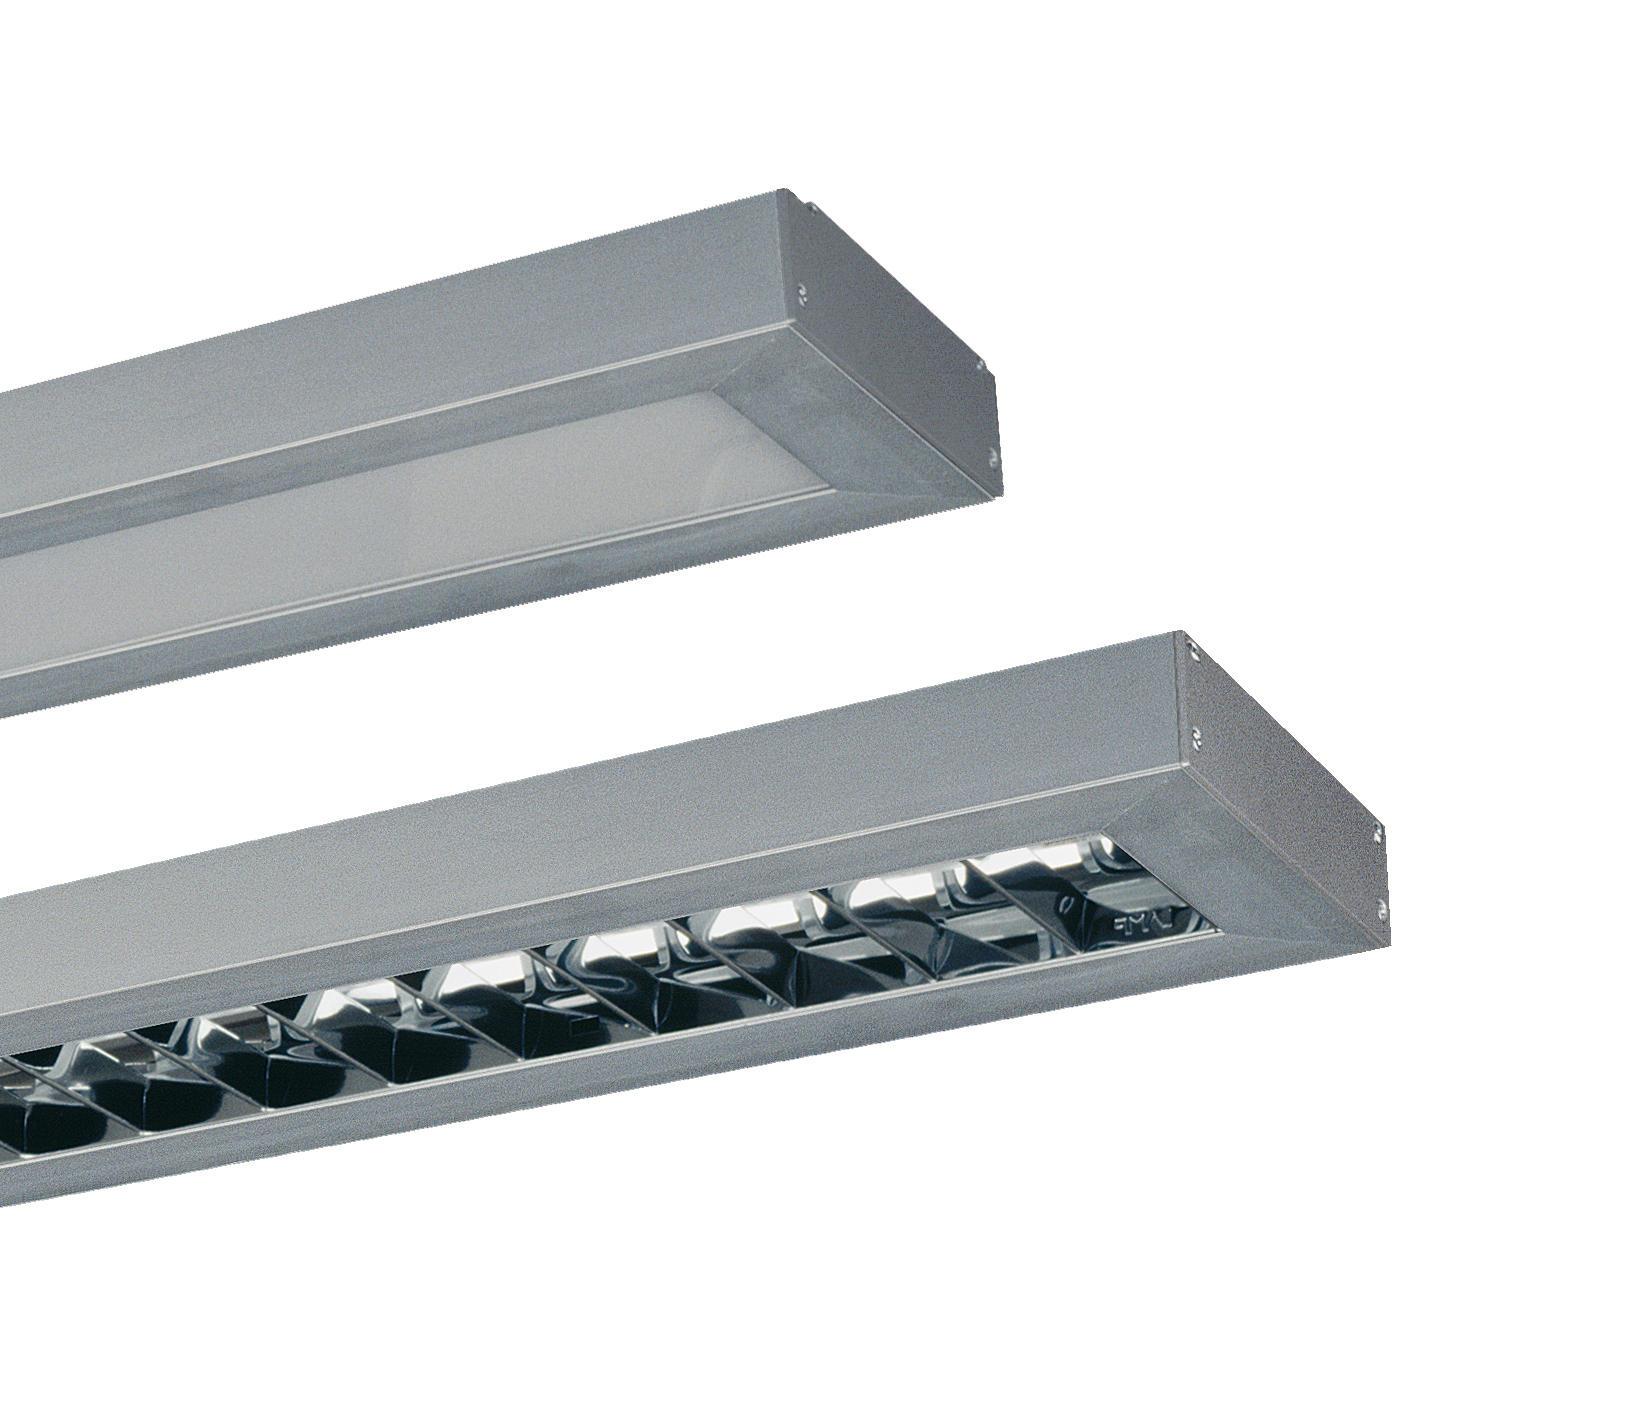 Dinamic Modular System General Lighting From Lamp